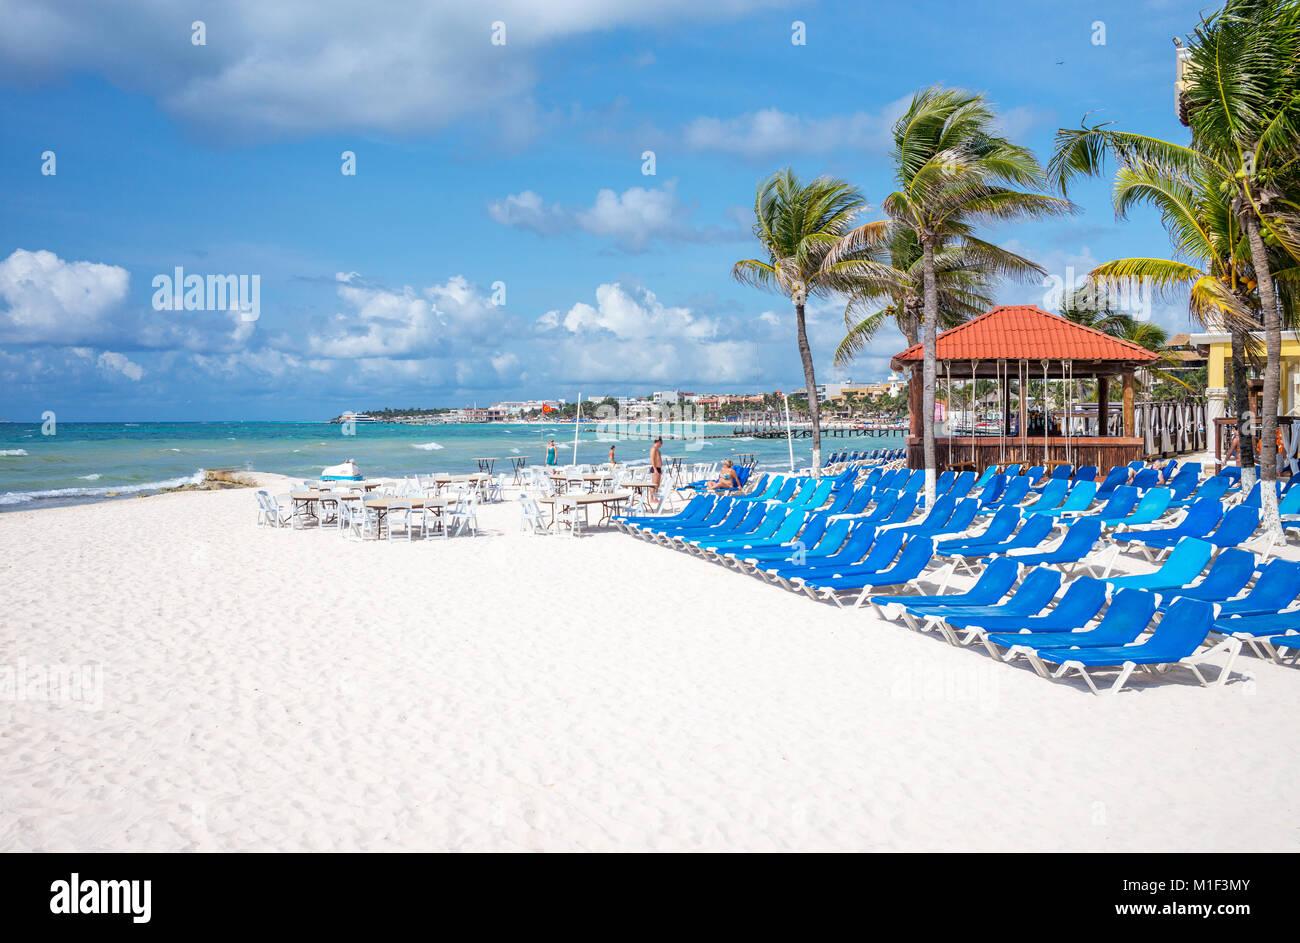 Playa Del Carmen, Mexico, Tourist facilities on the beach - Stock Image